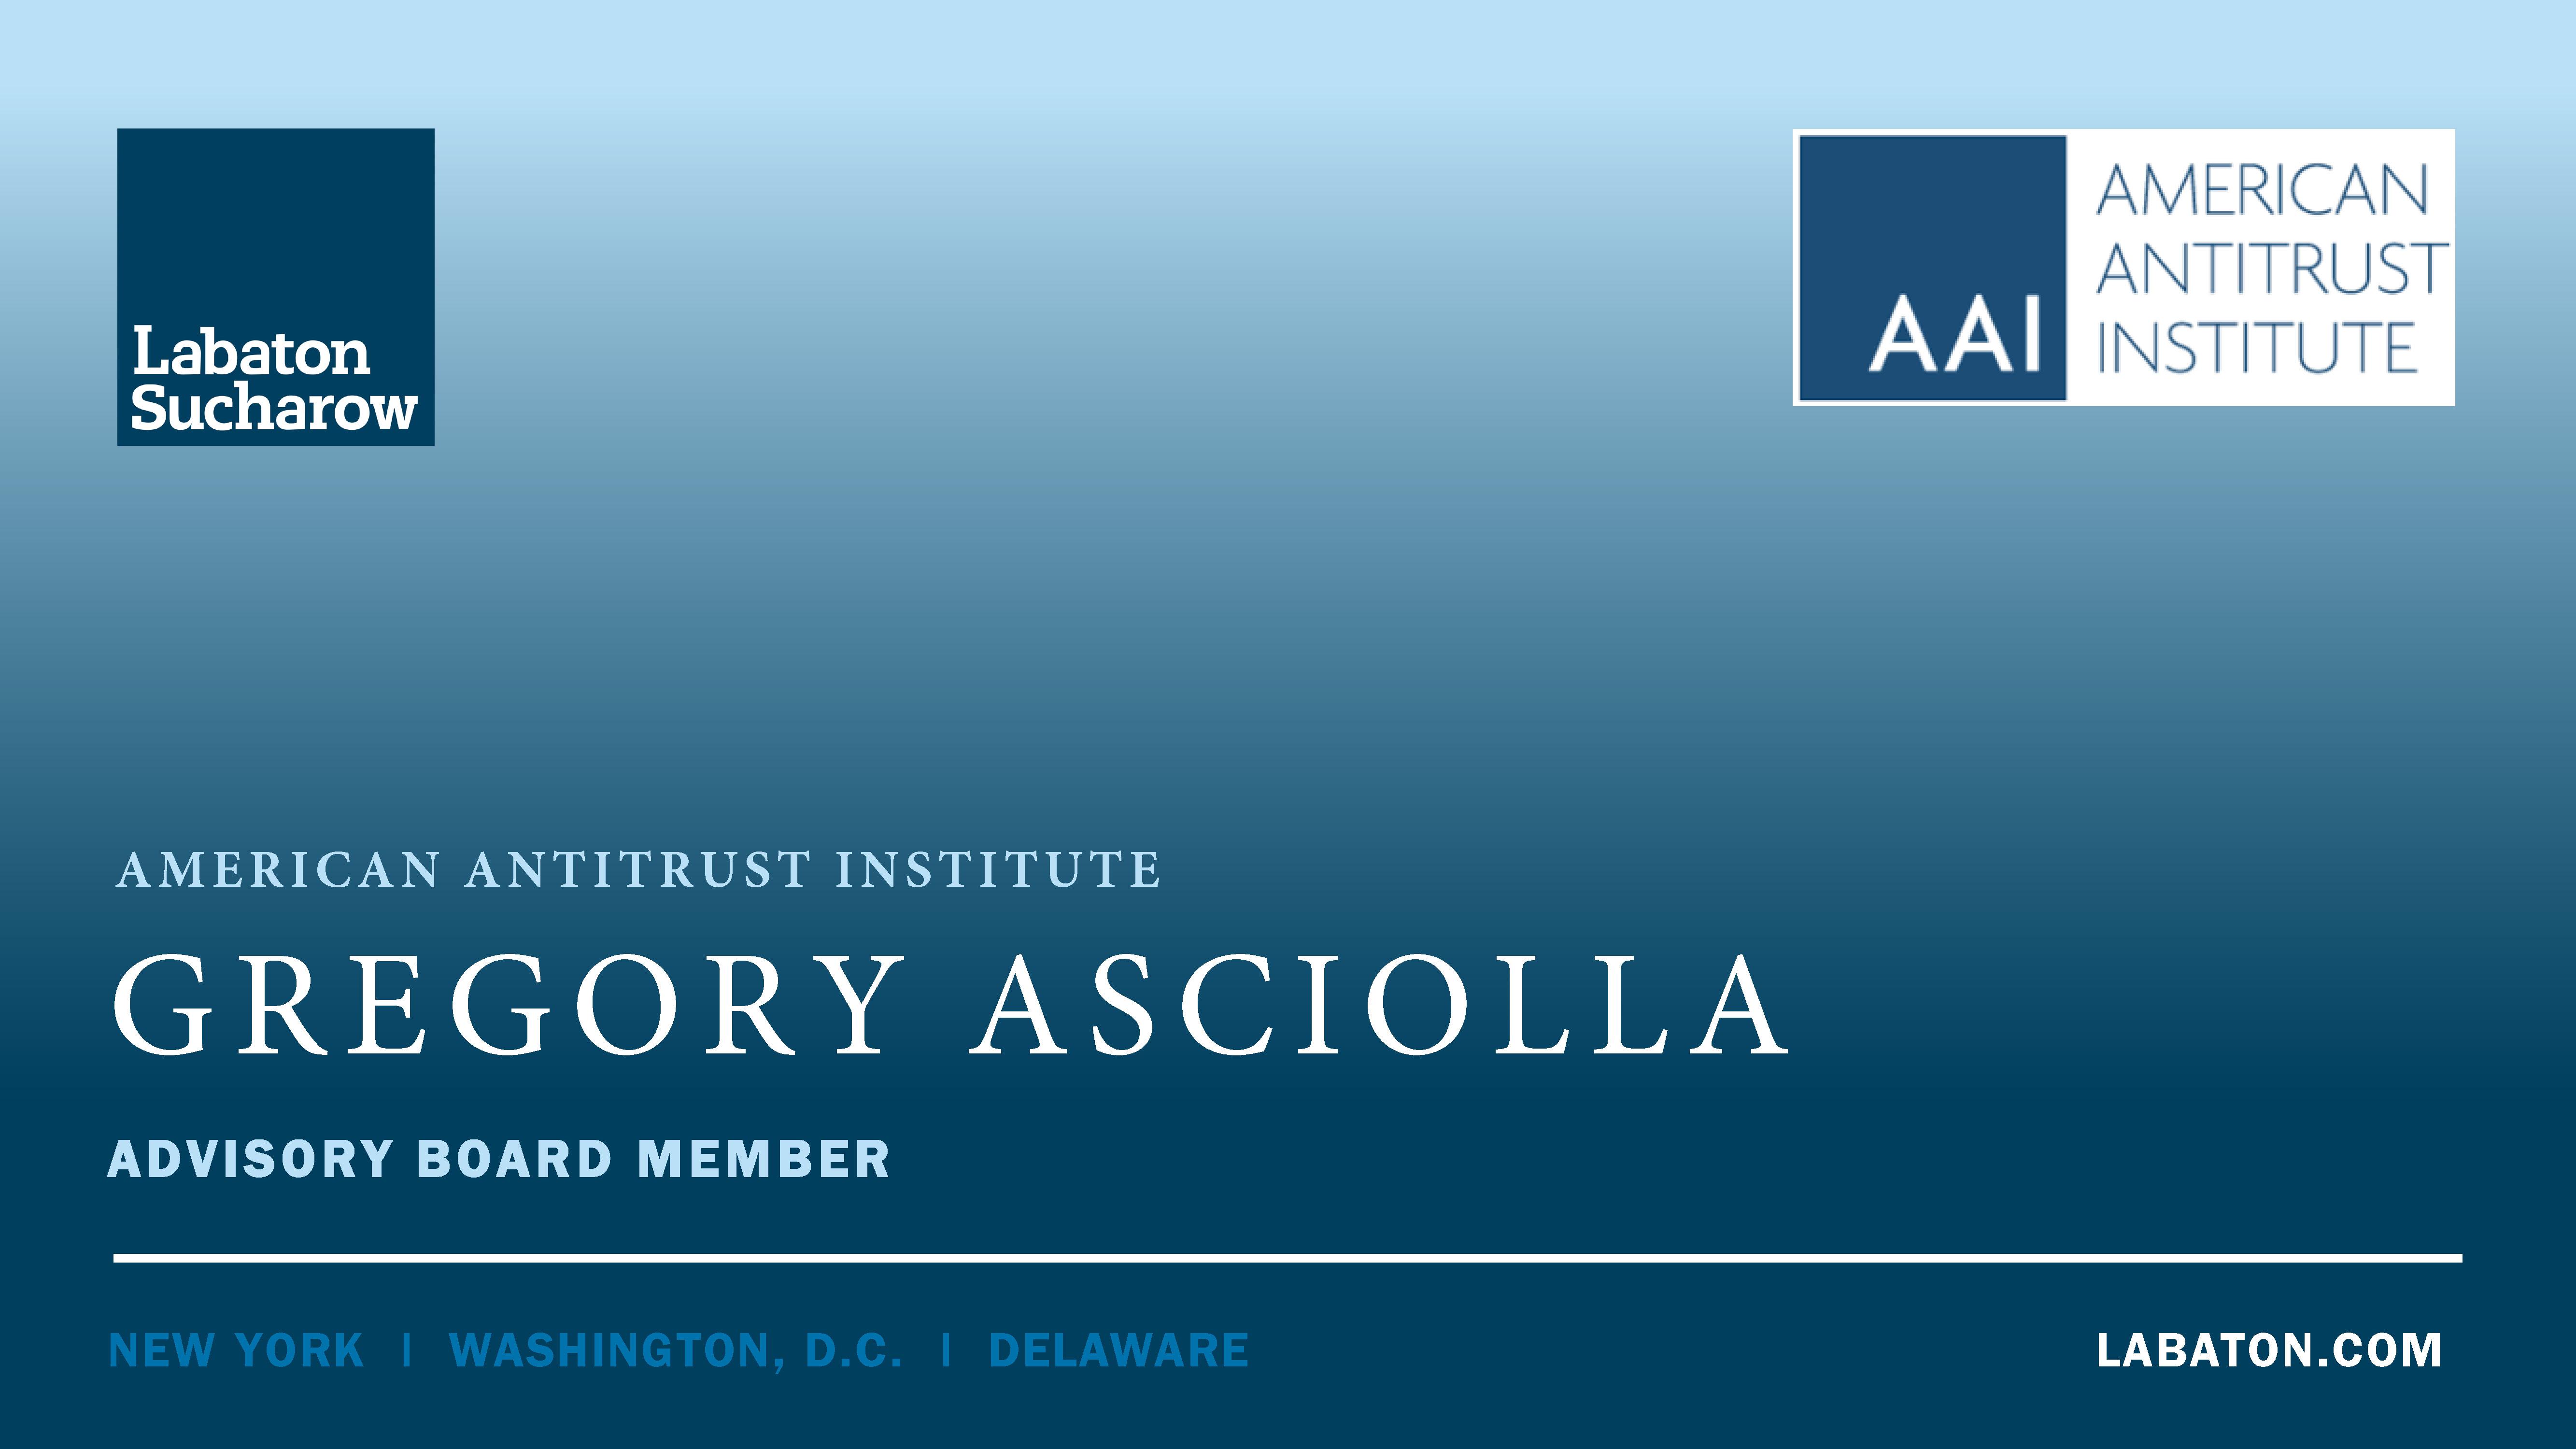 Gregory Asciolla - American Antitrust Advisory Board Member